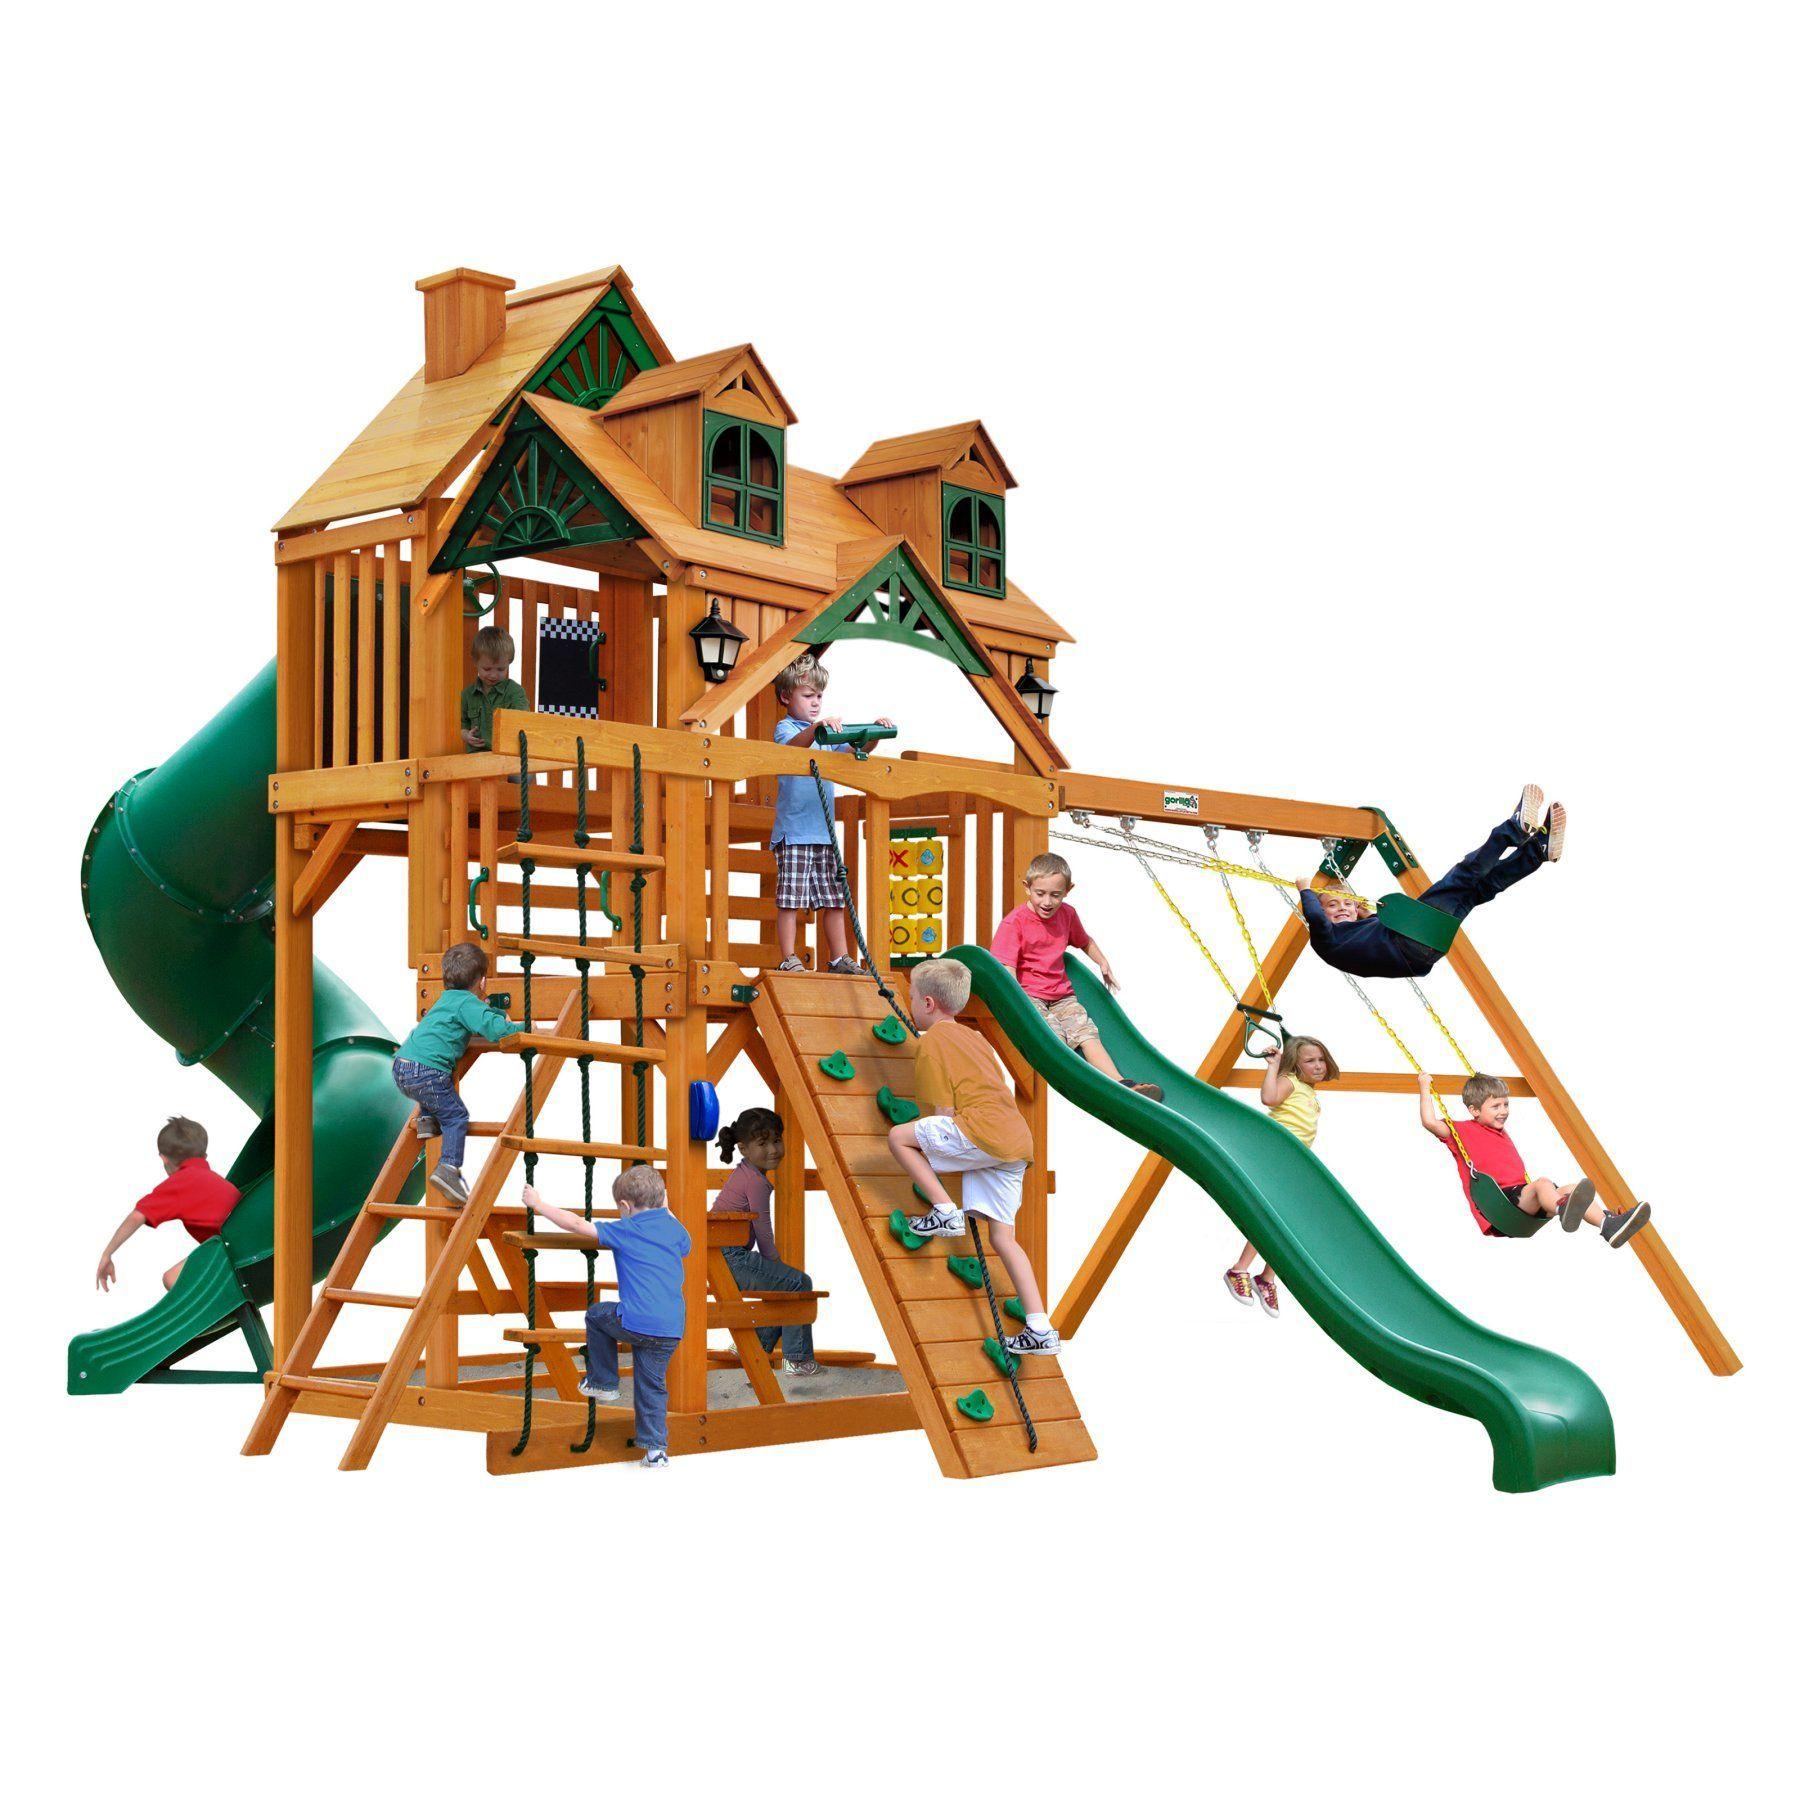 Gorilla playsets malibu deluxe i swing set ap products